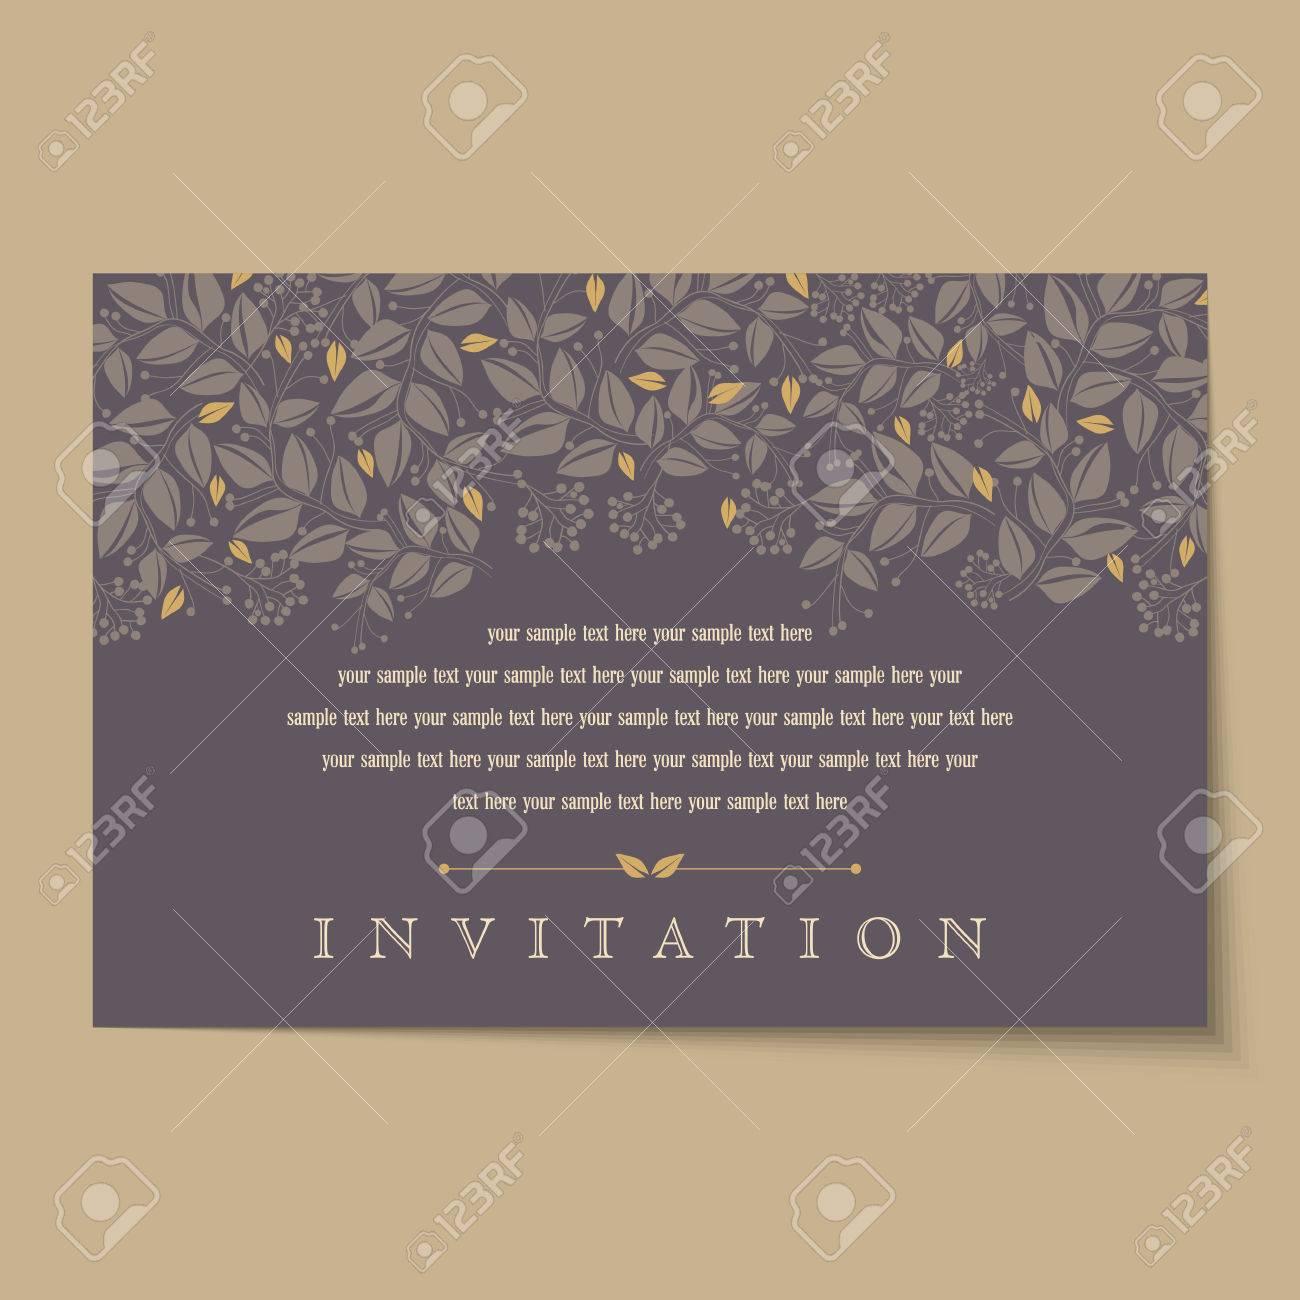 Beautiful vintage invitation cards layouts - 37152997